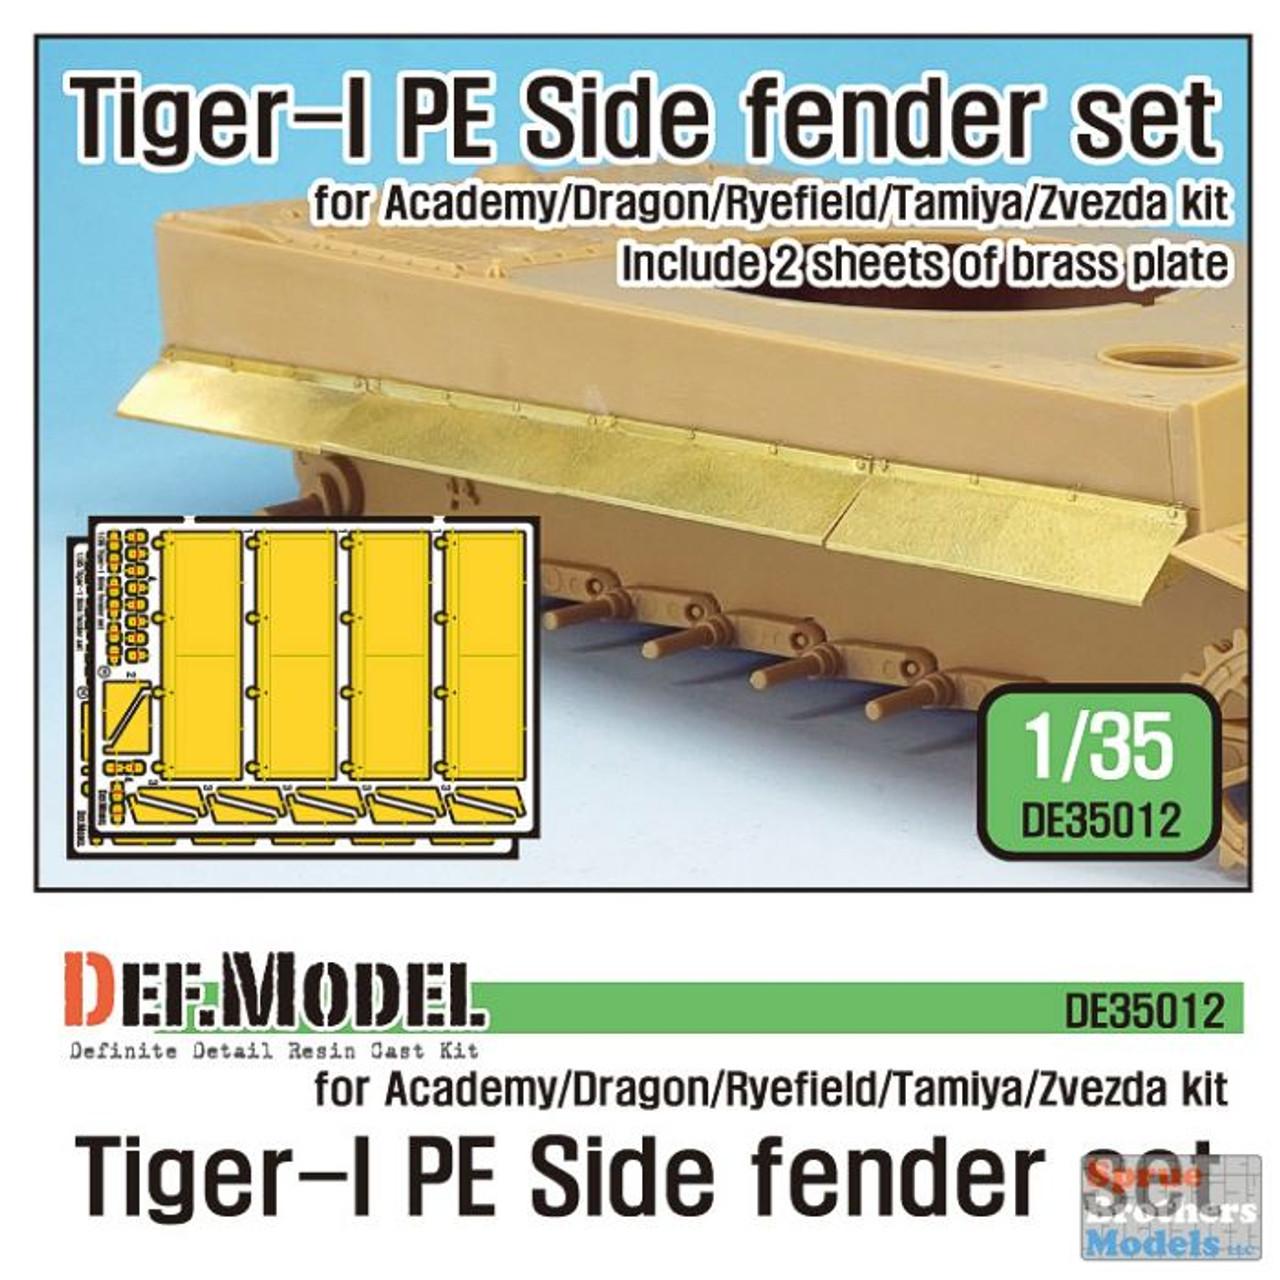 DEFDE35012 1:35 DEF Model Tiger I Side Fender Set (TAM/ACA/DRA/RFM/ZVE kit)